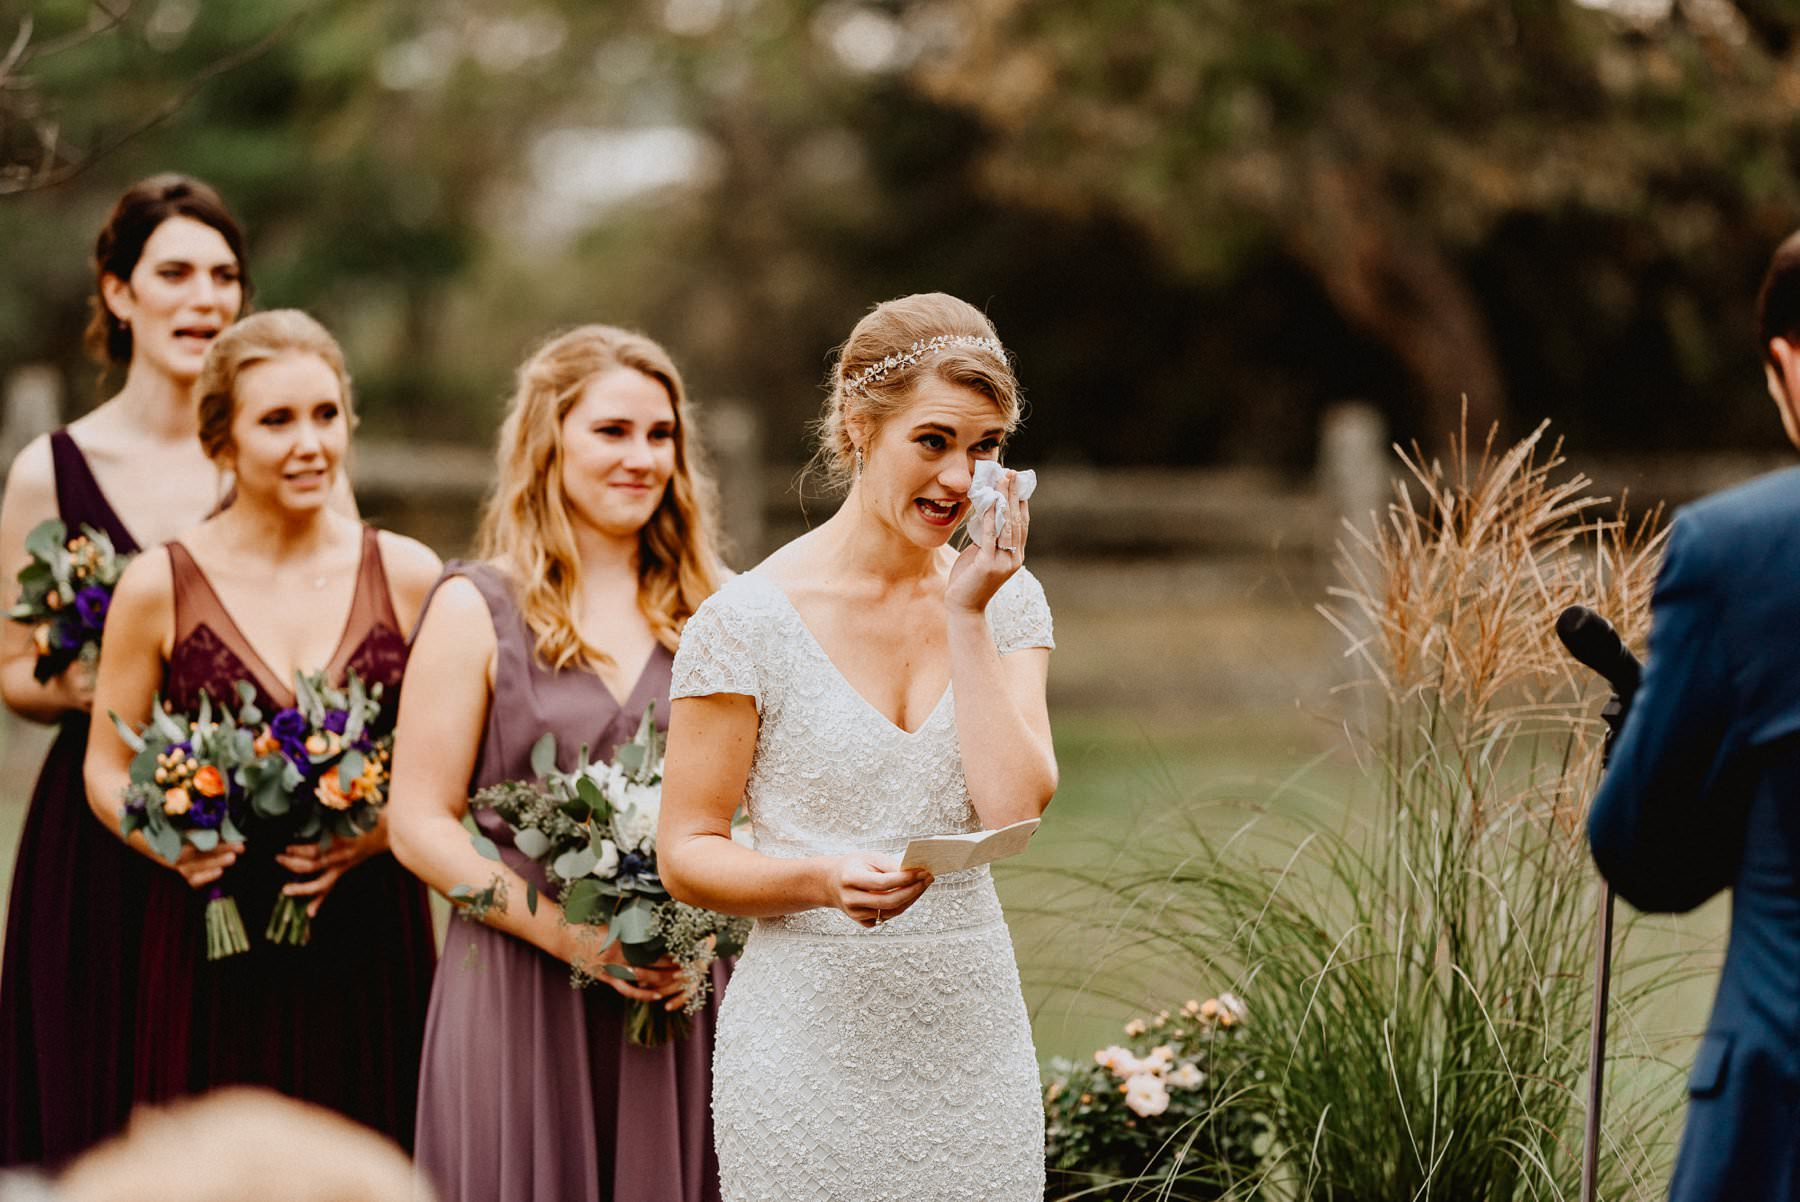 John_James_Audubon_Center_wedding-49.jpg